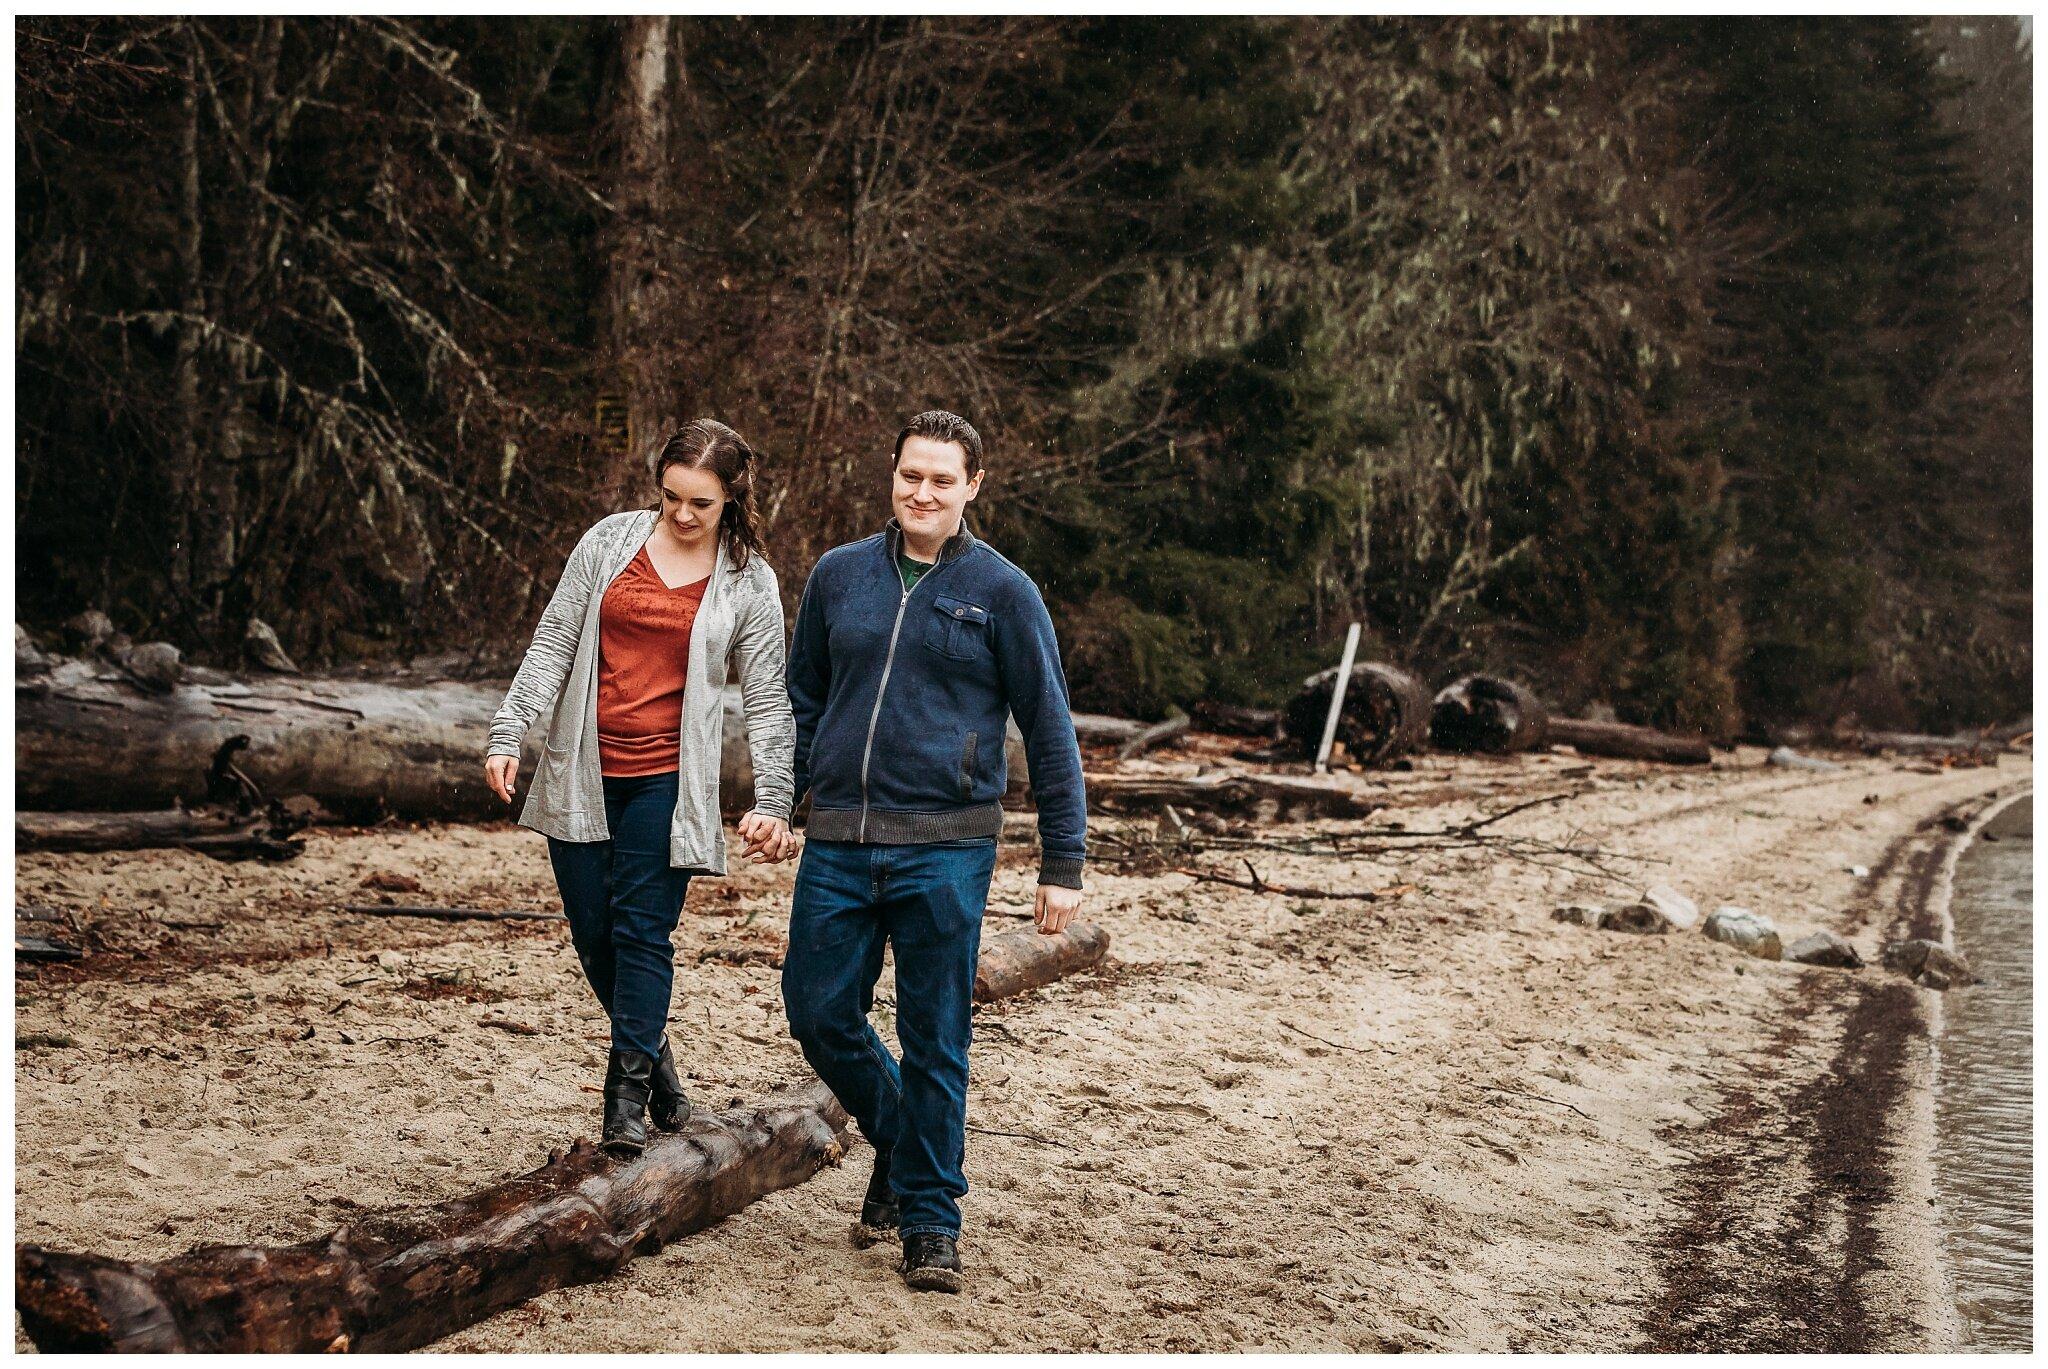 Chilliwack Lake Rainy Winter Engagement Photography Session Couples Photographer_0007.jpg